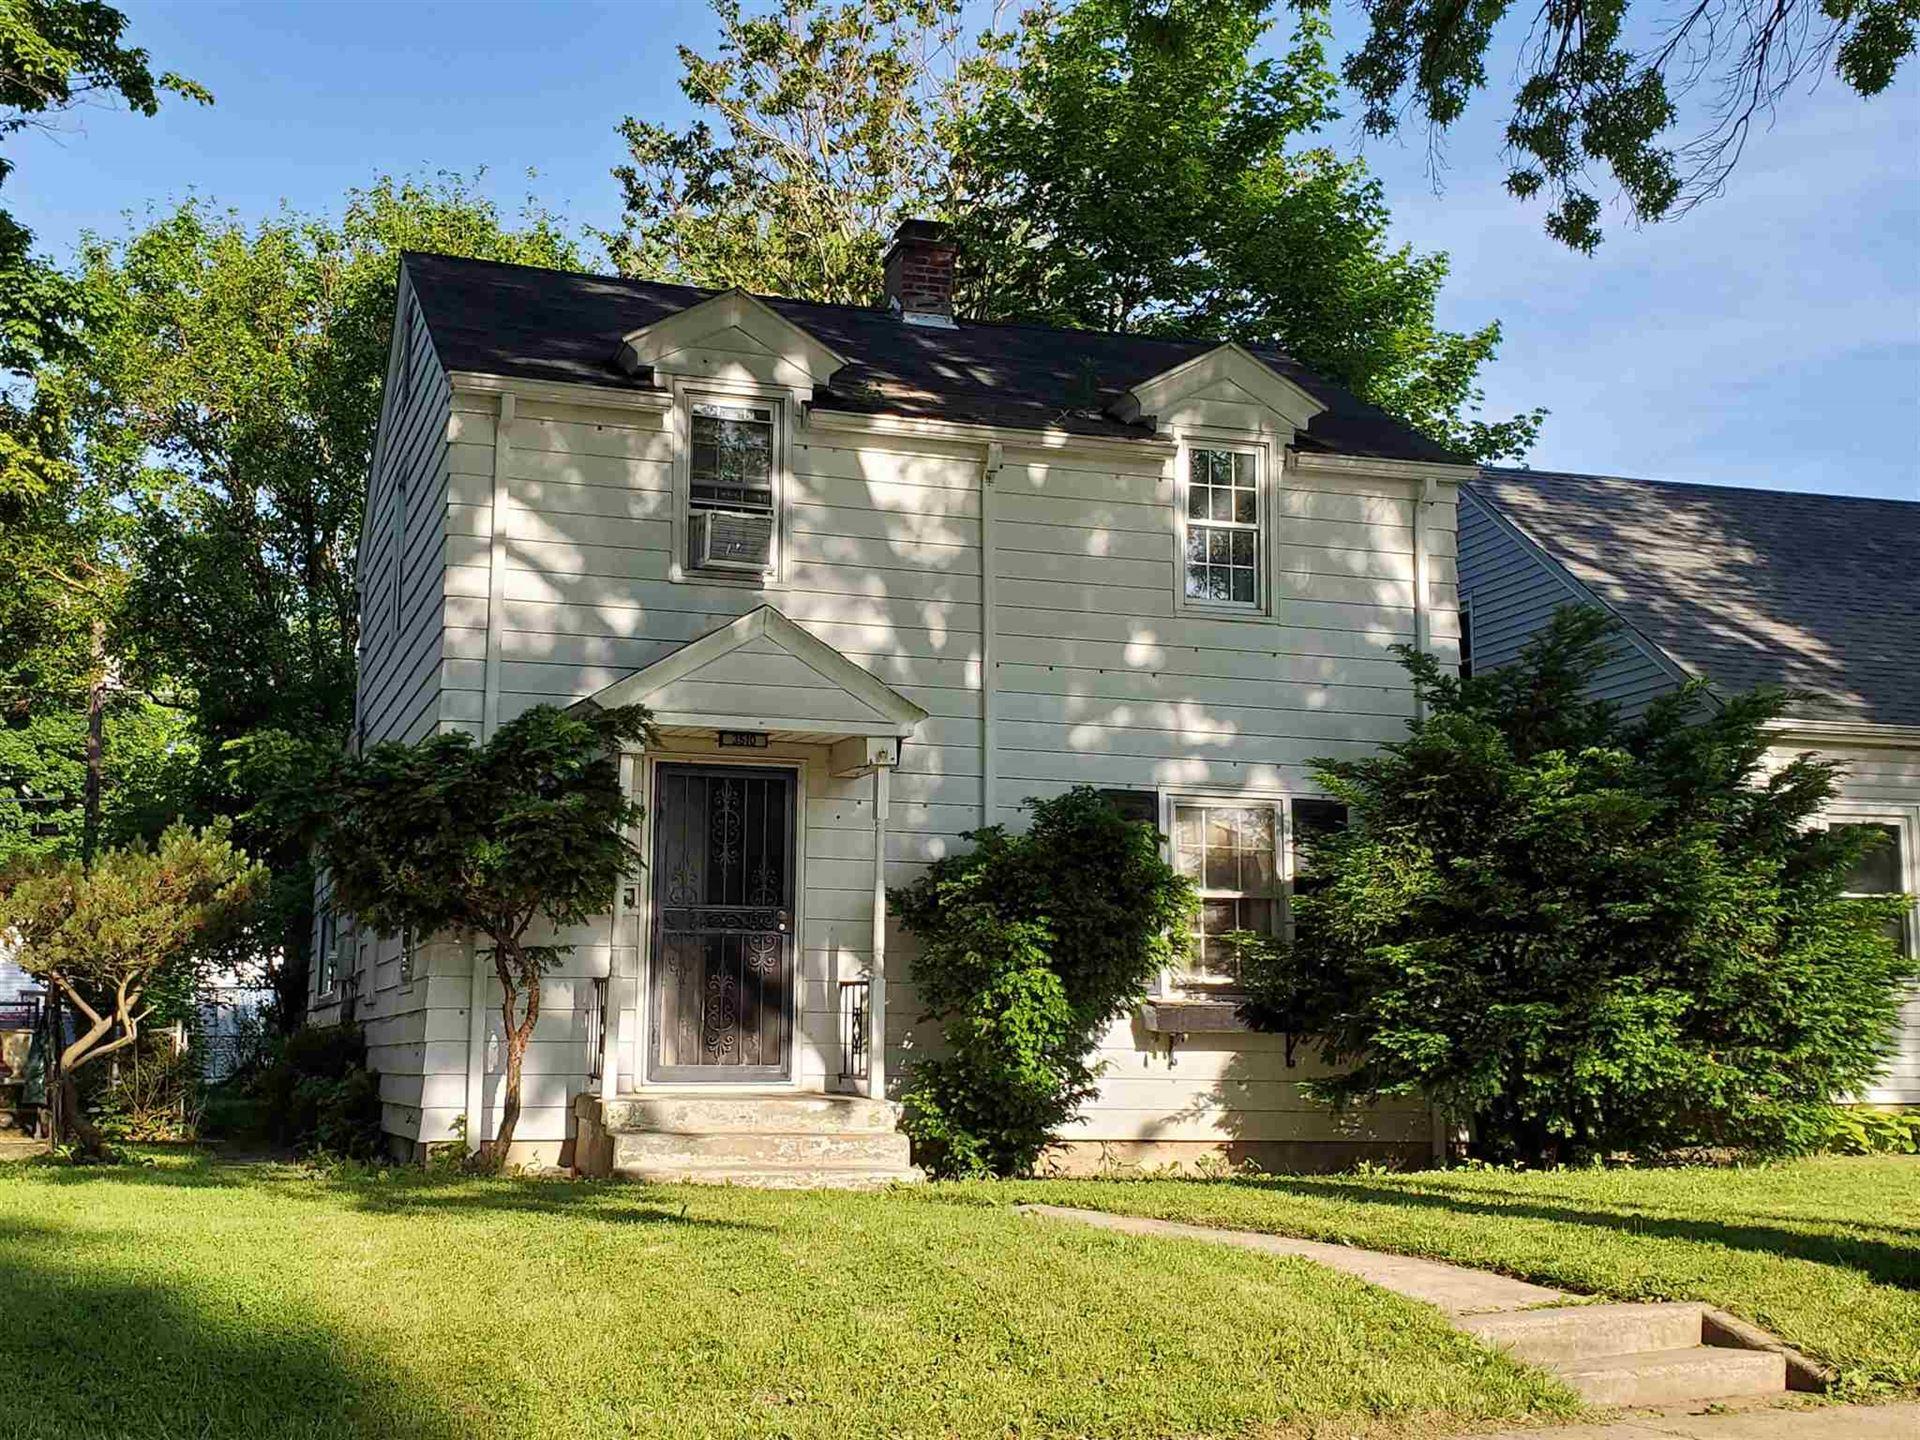 3510 Robinwood Drive, Fort Wayne, IN 46806 - #: 202021356